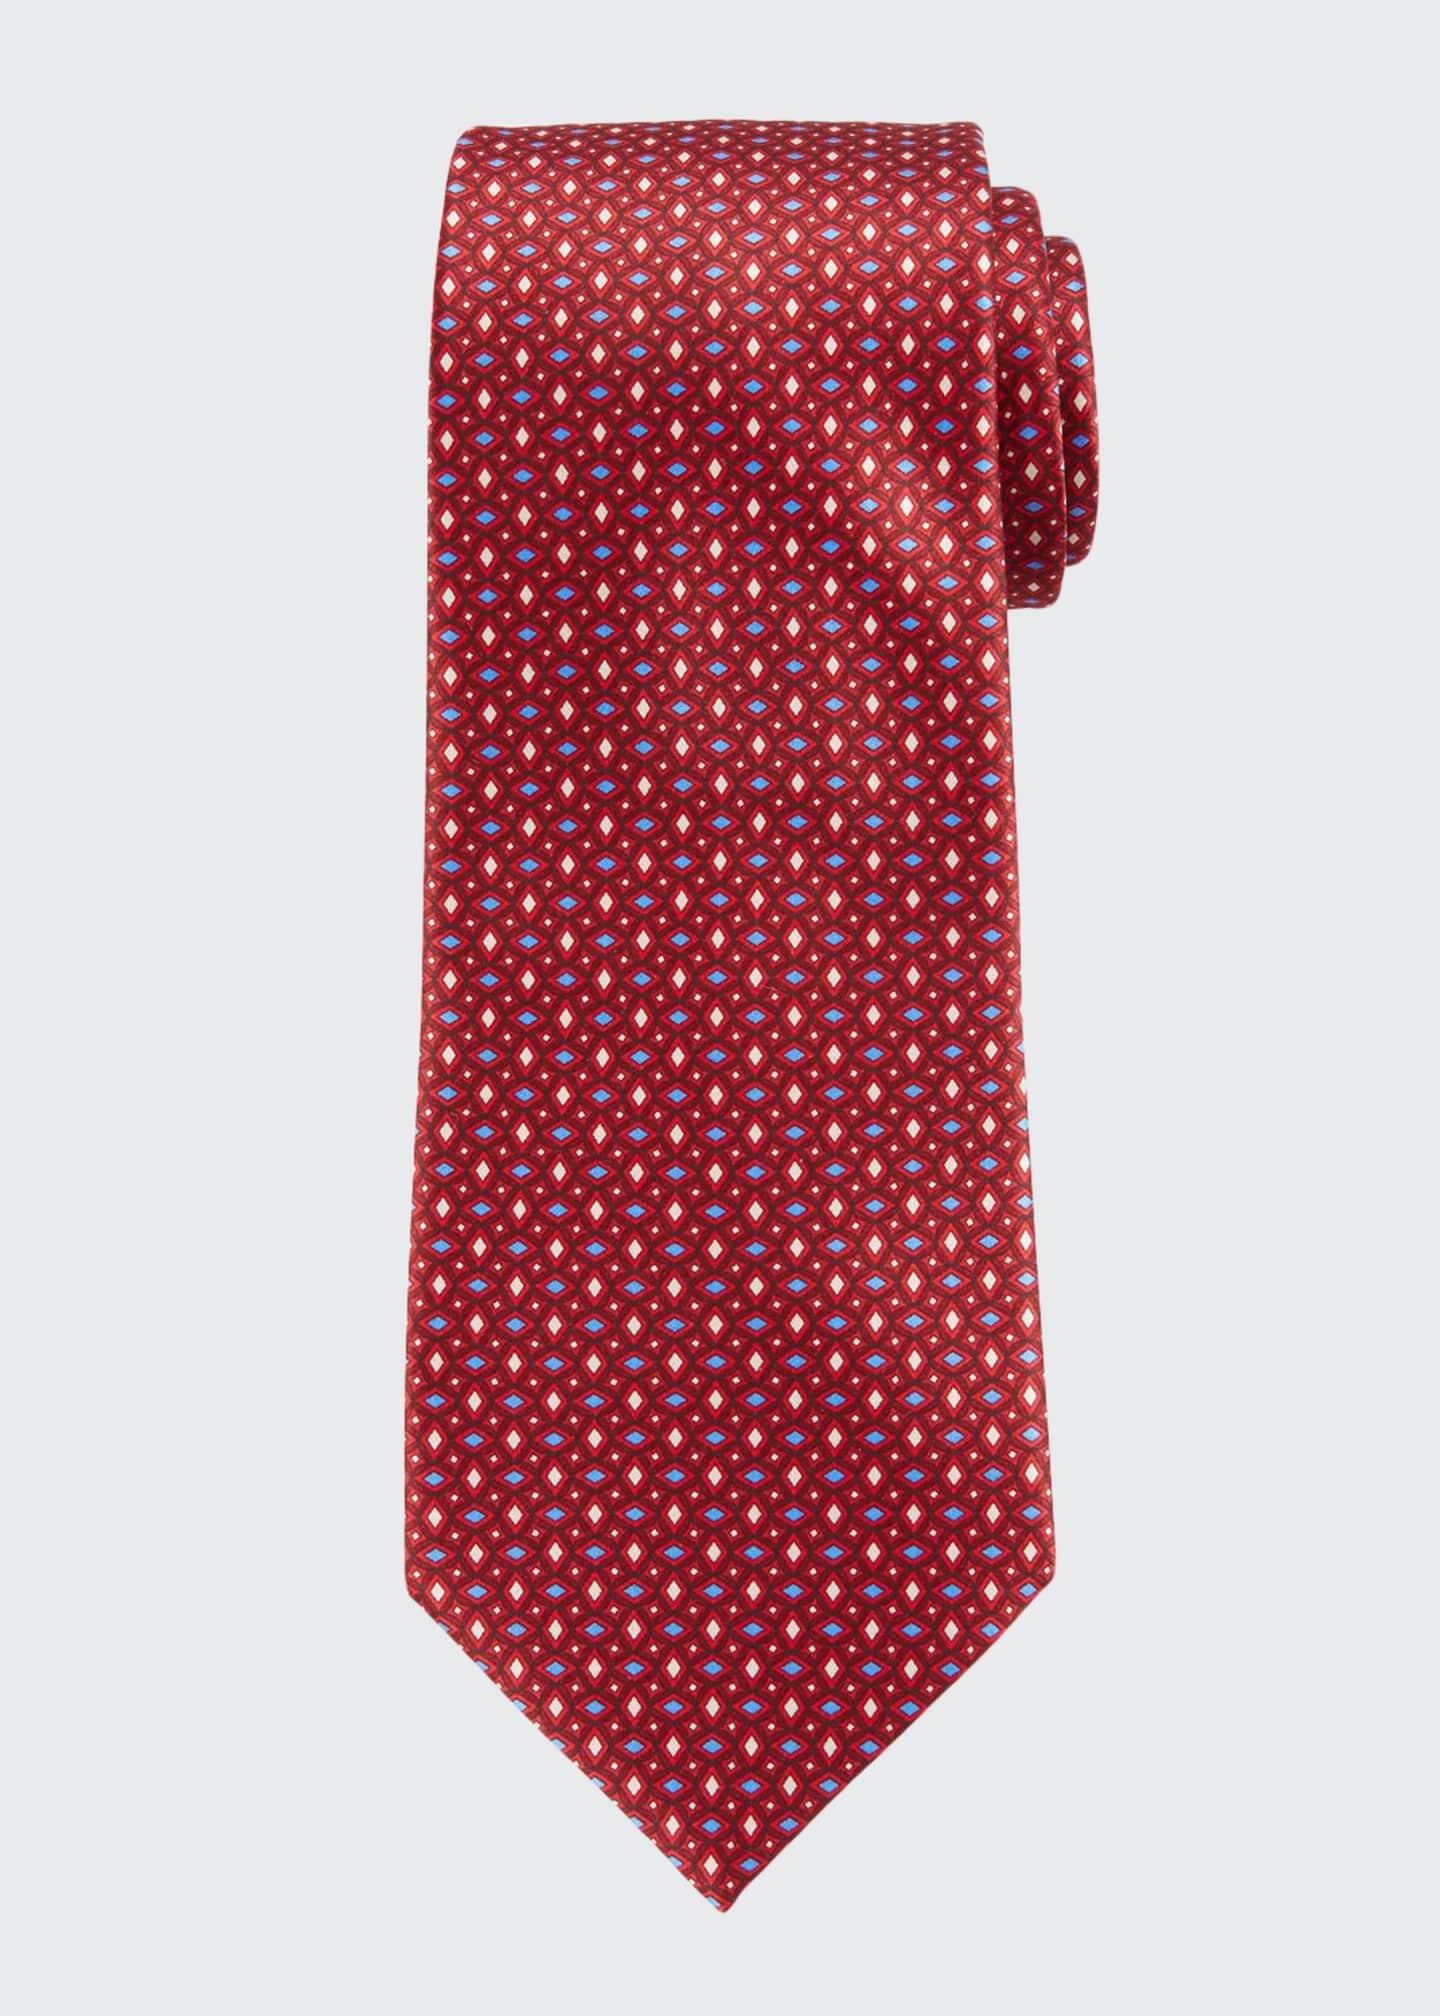 Ermenegildo Zegna Men's Alternating Diamonds Silk Tie, Red